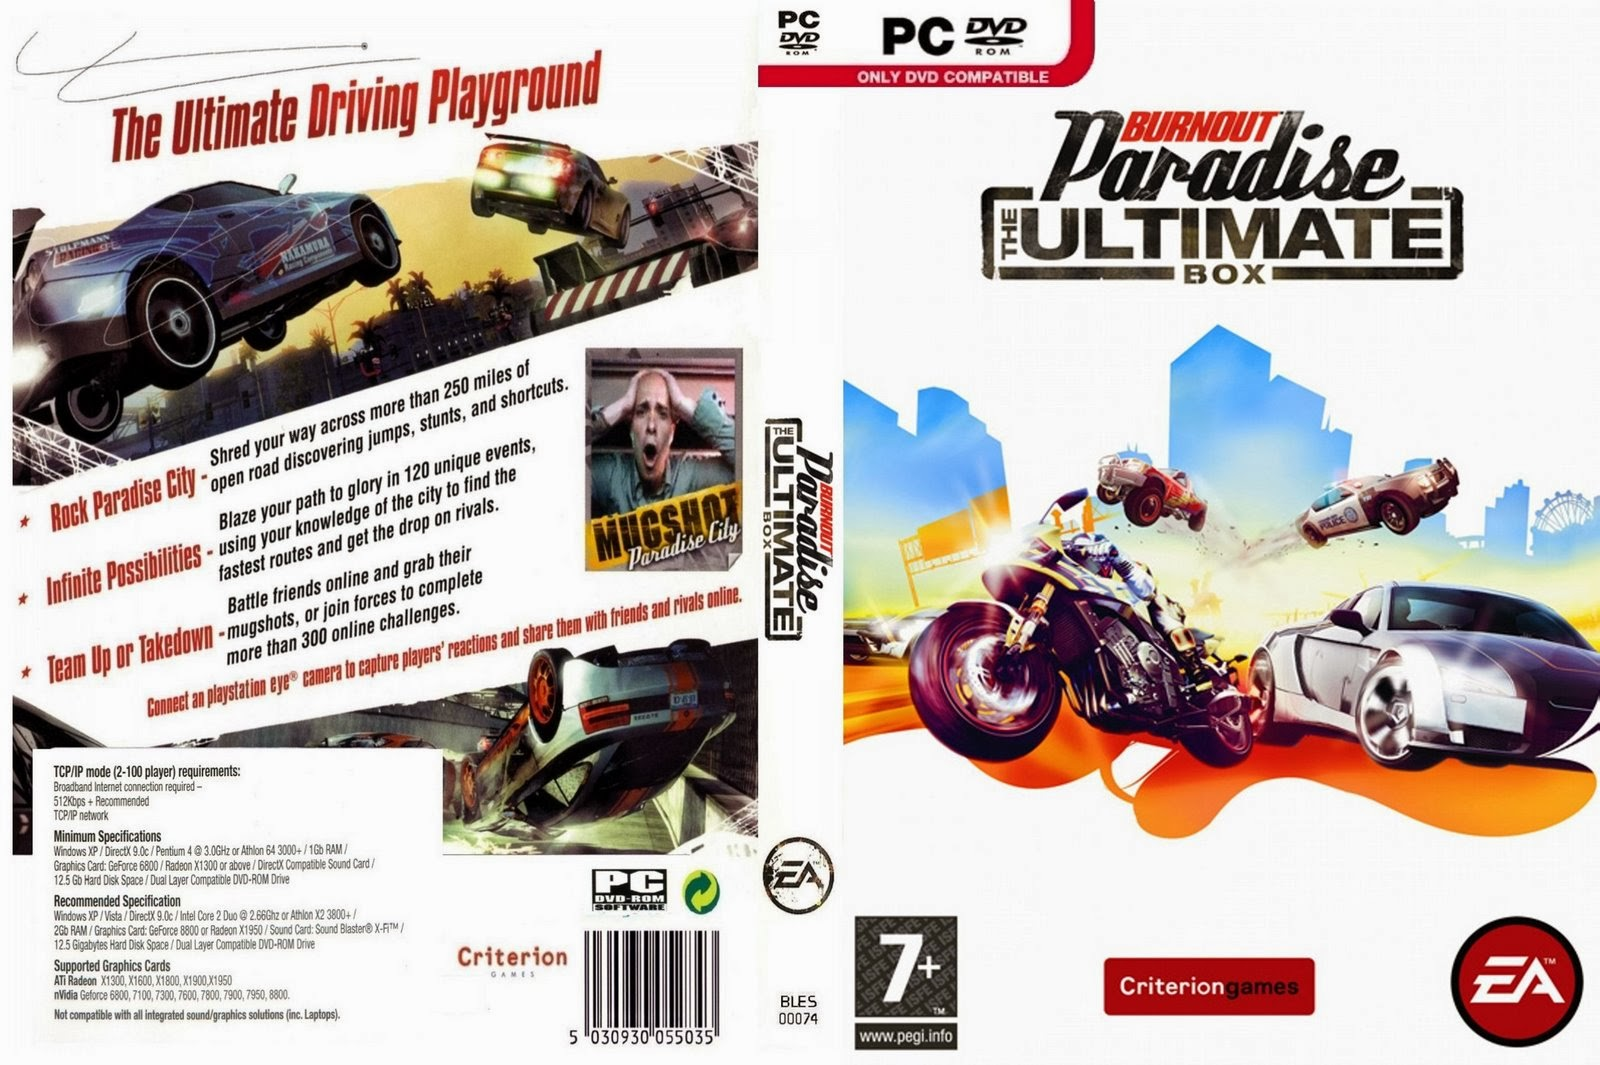 BURNOUT PARADISE PC Download Free Full Version Game Mac, PS3